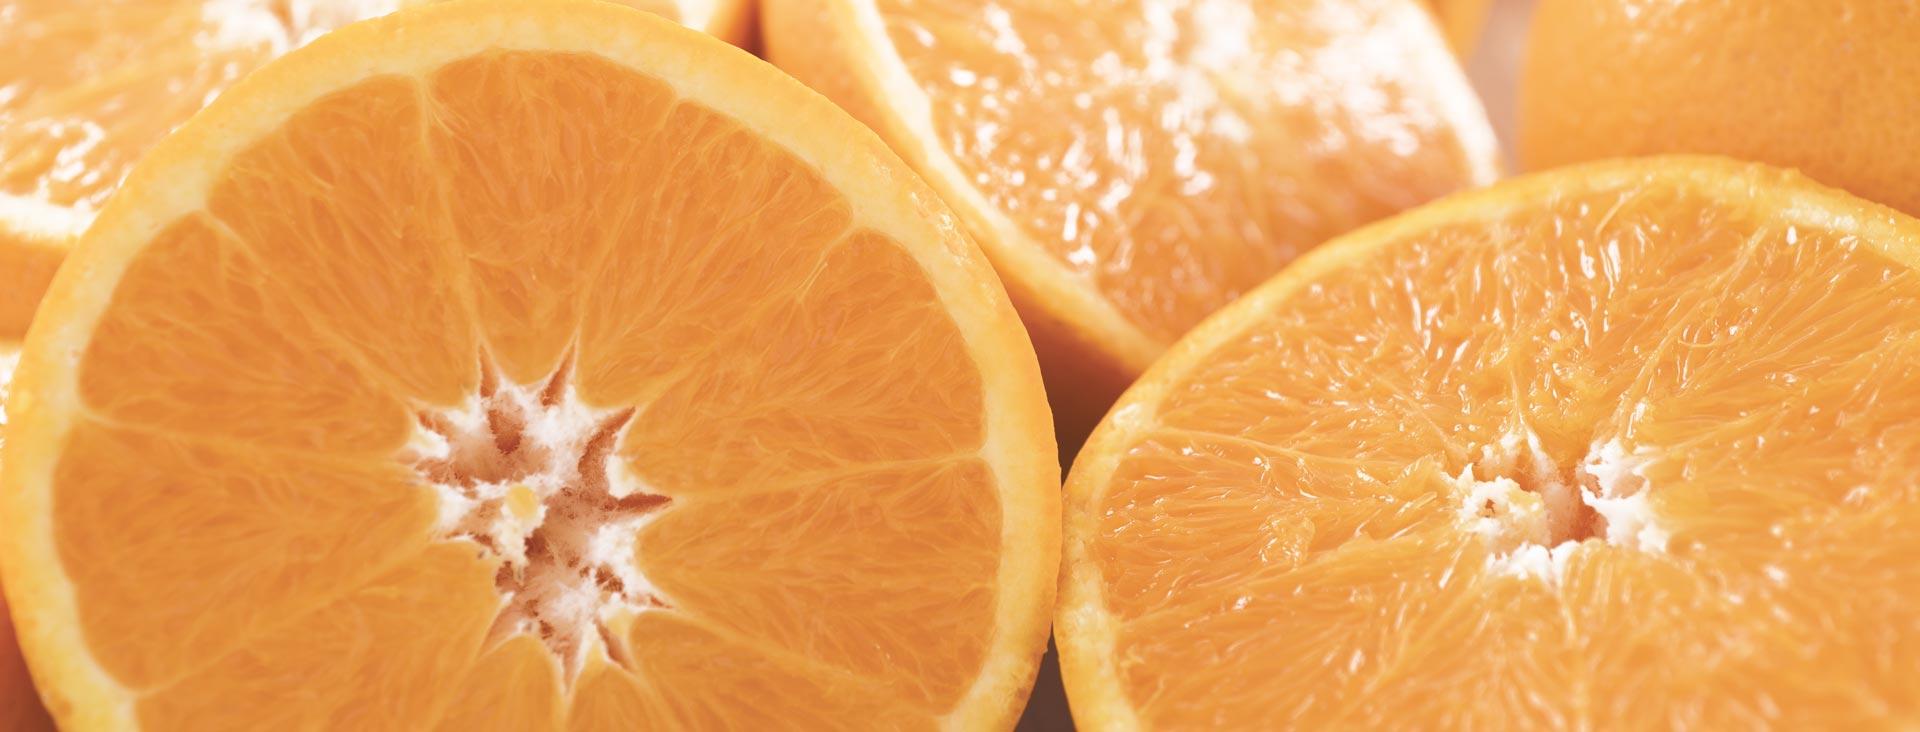 Naranjas de Citrama